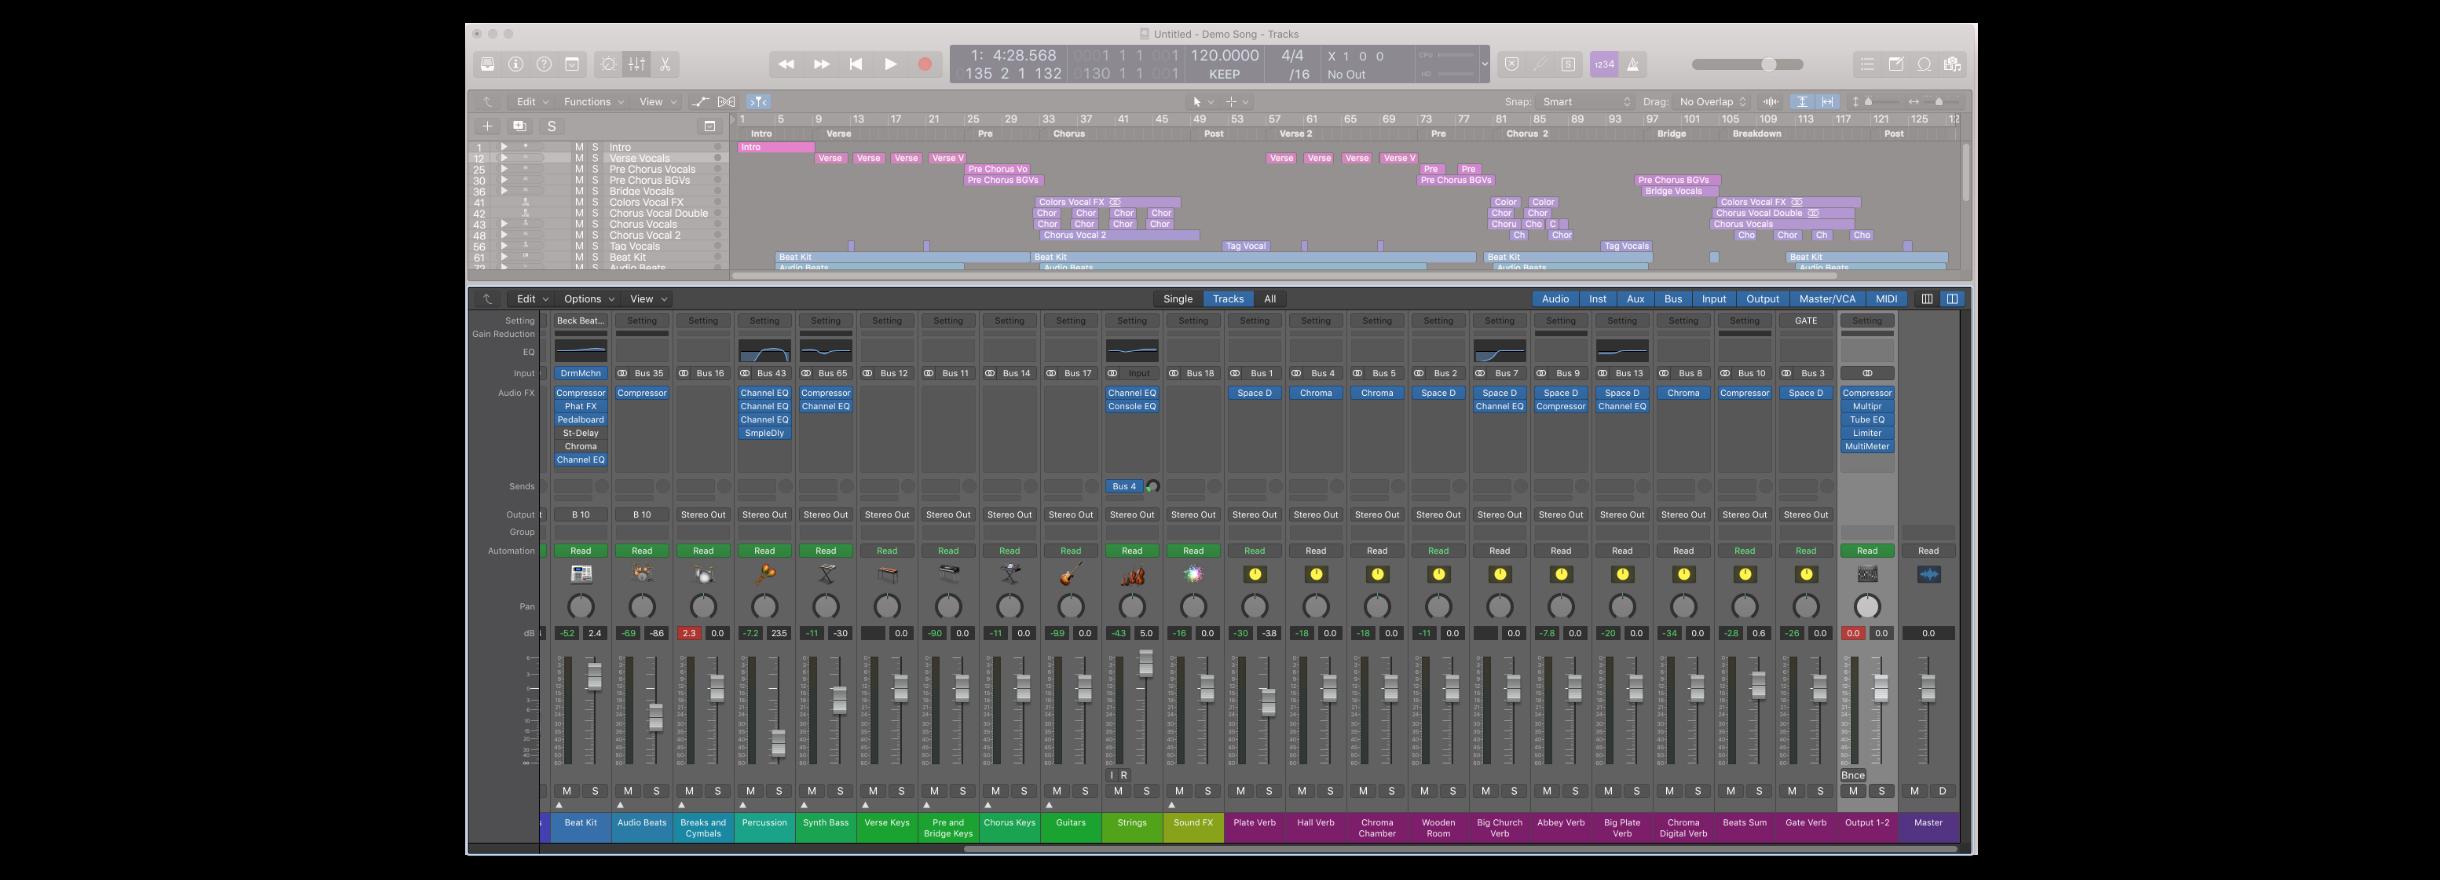 Mixer 視窗在開啟後會顯示在 Logic Pro 的下方,開啟的快捷鍵是 X